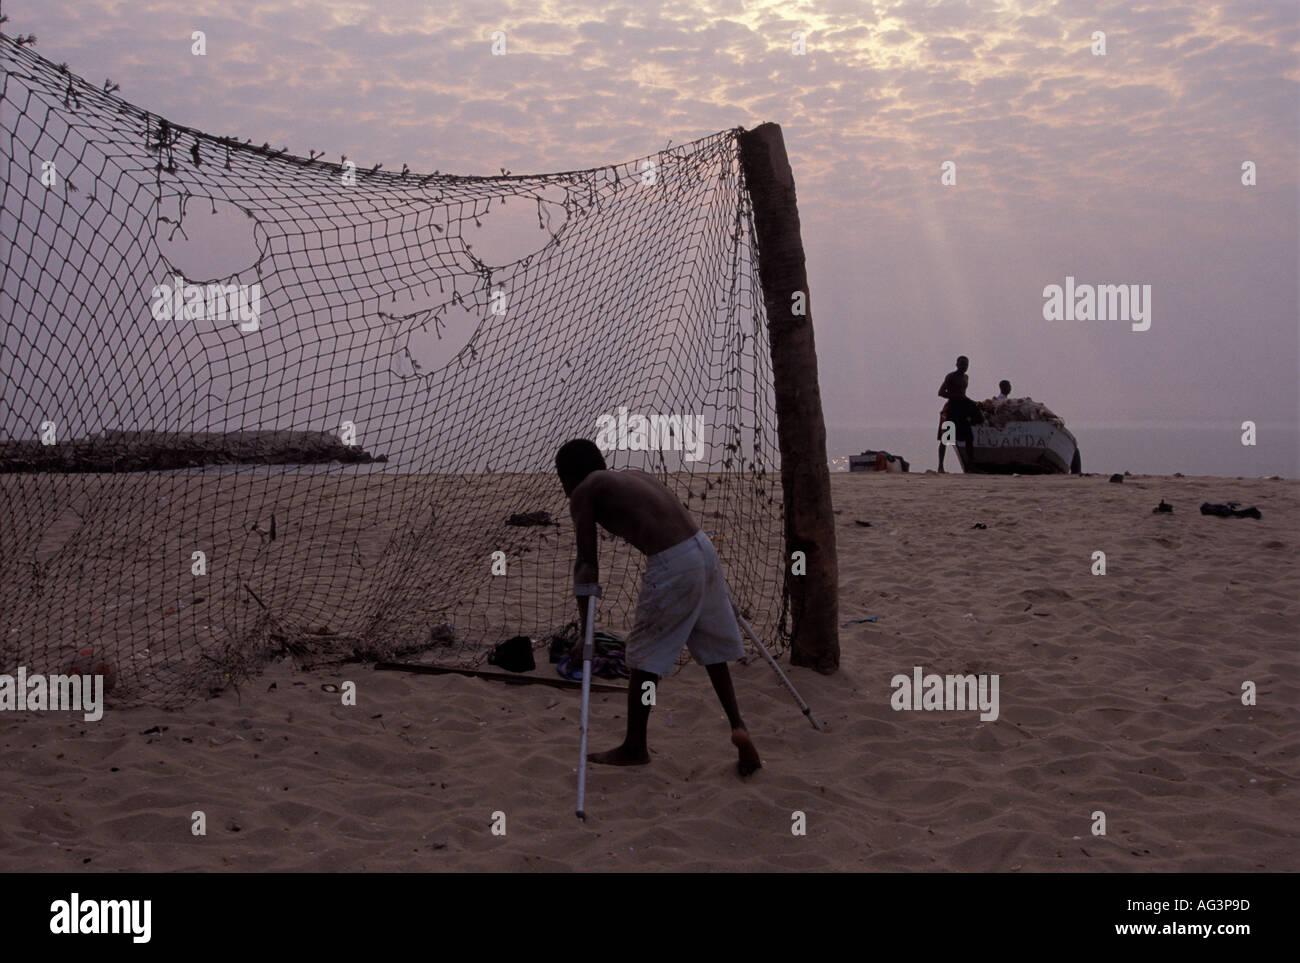 Angola Luanda Polio victim poverty disease - Stock Image